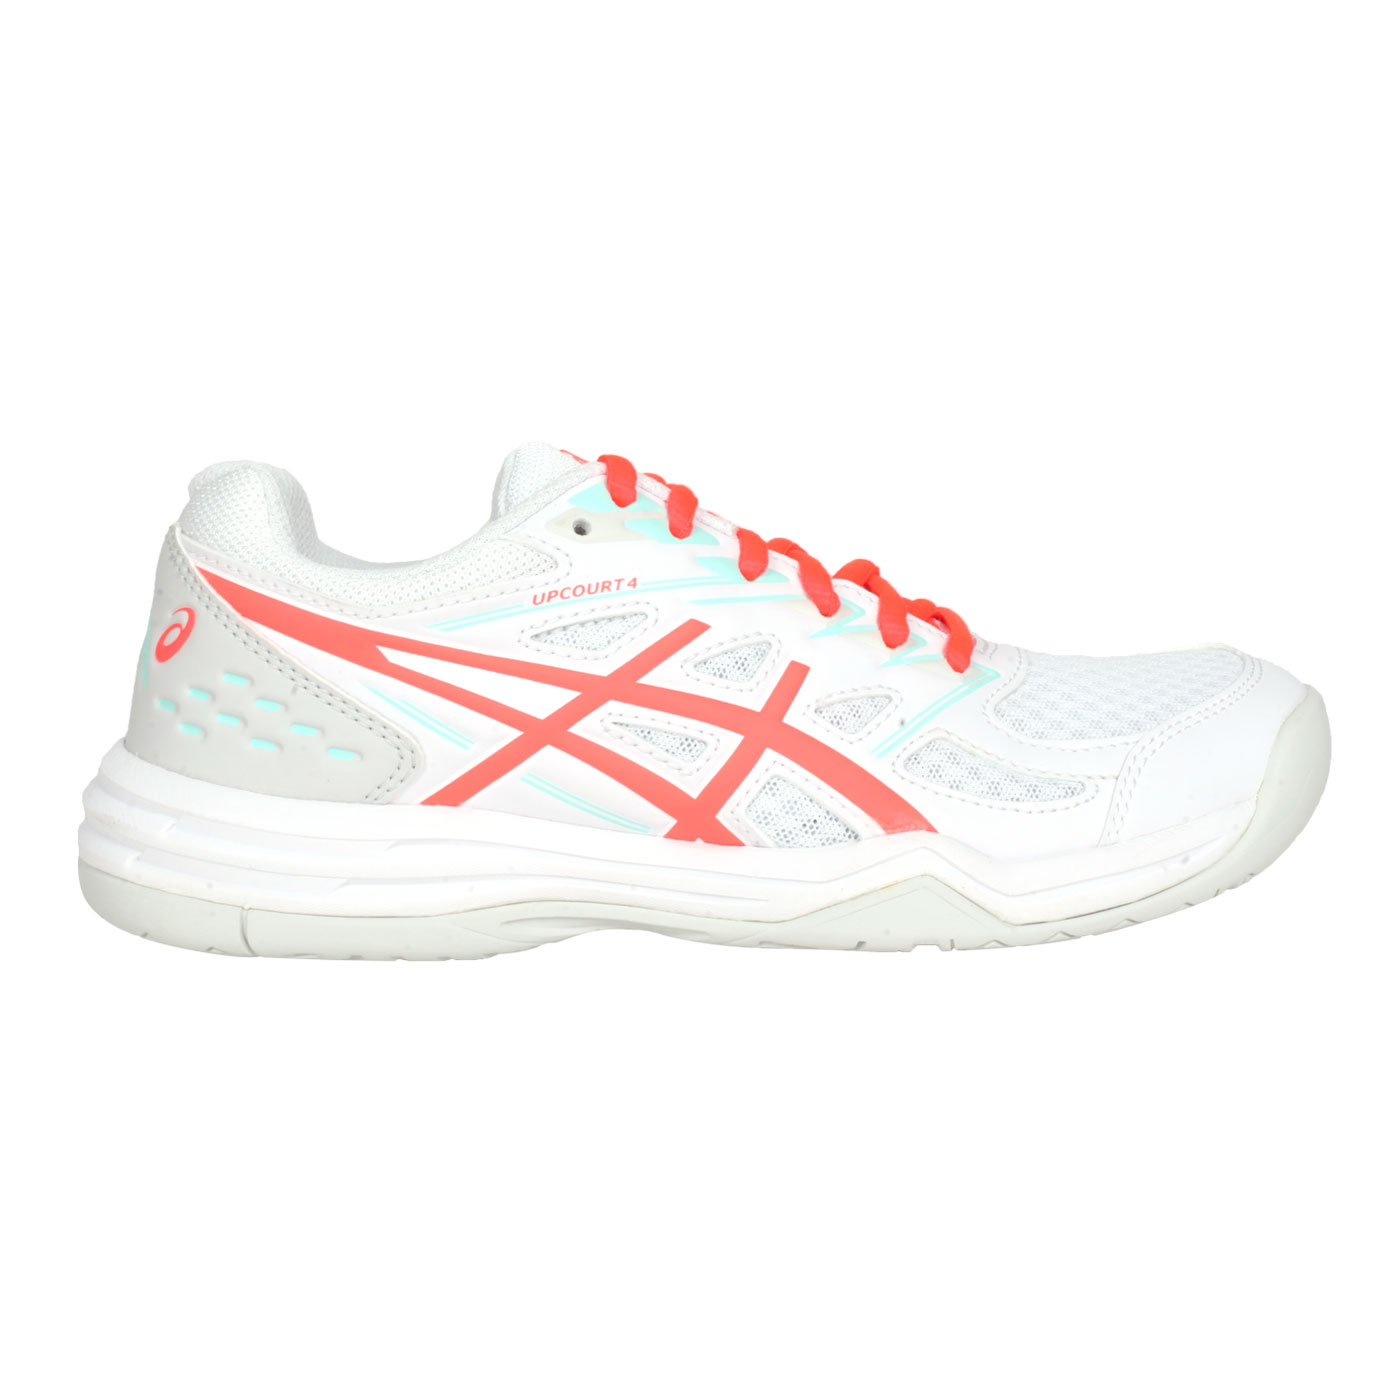 ASICS 女款排羽球鞋  @UPCOURT 4@1072A055-960 - 白螢光橘